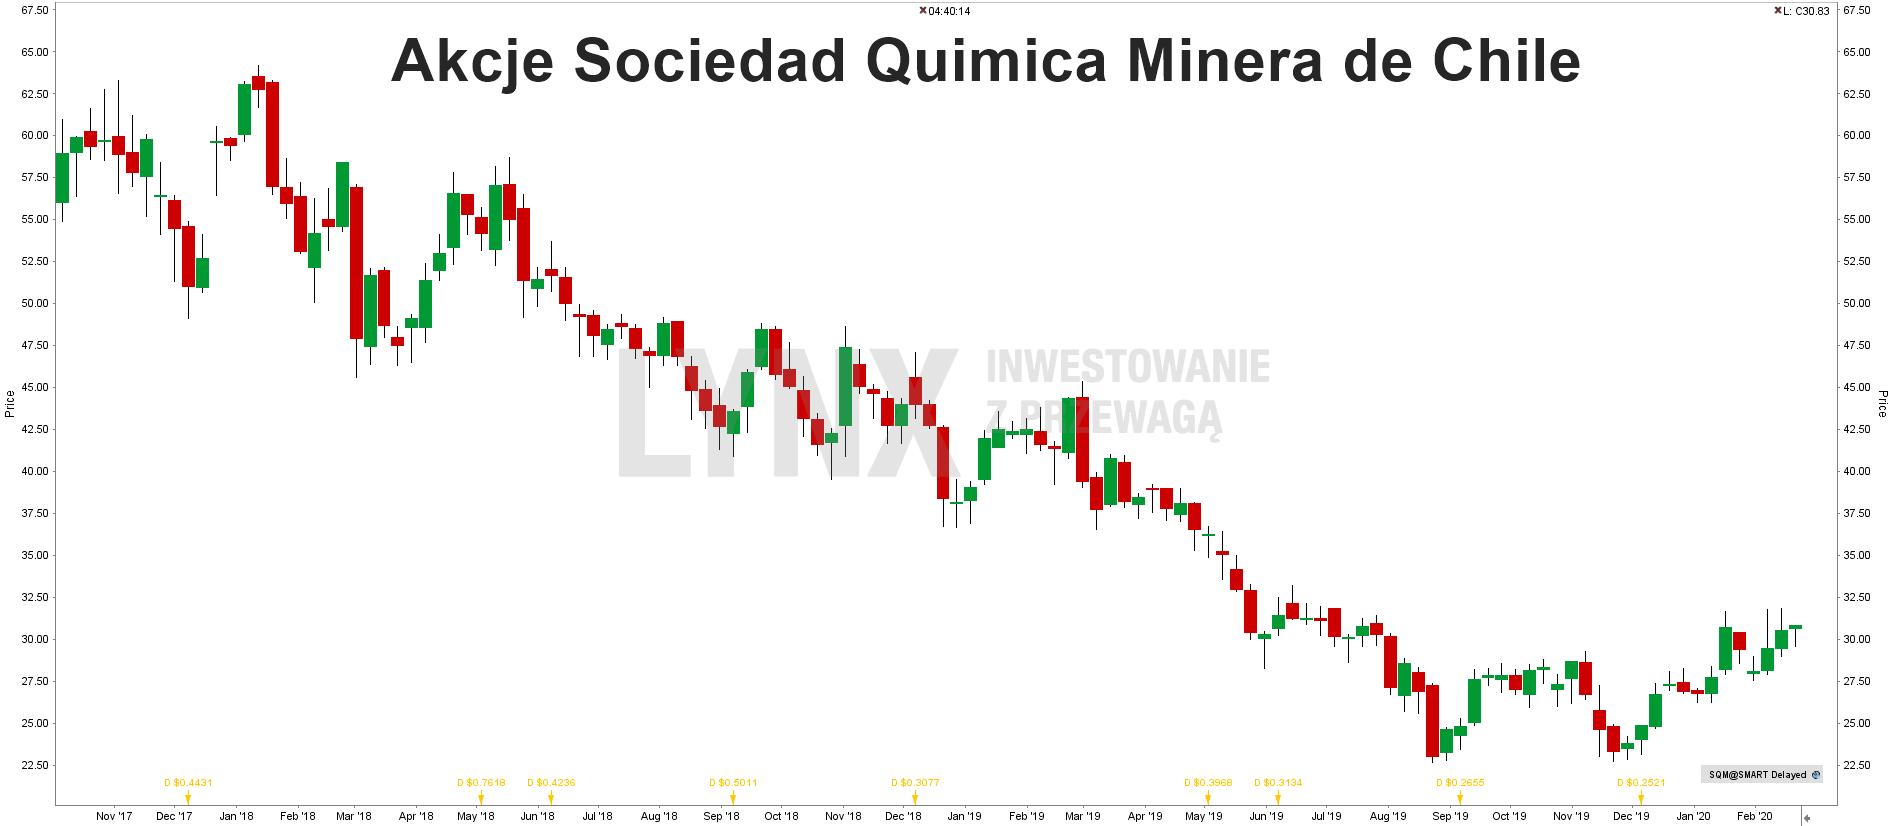 Akcje Sociedad Quimica Minera de Chile